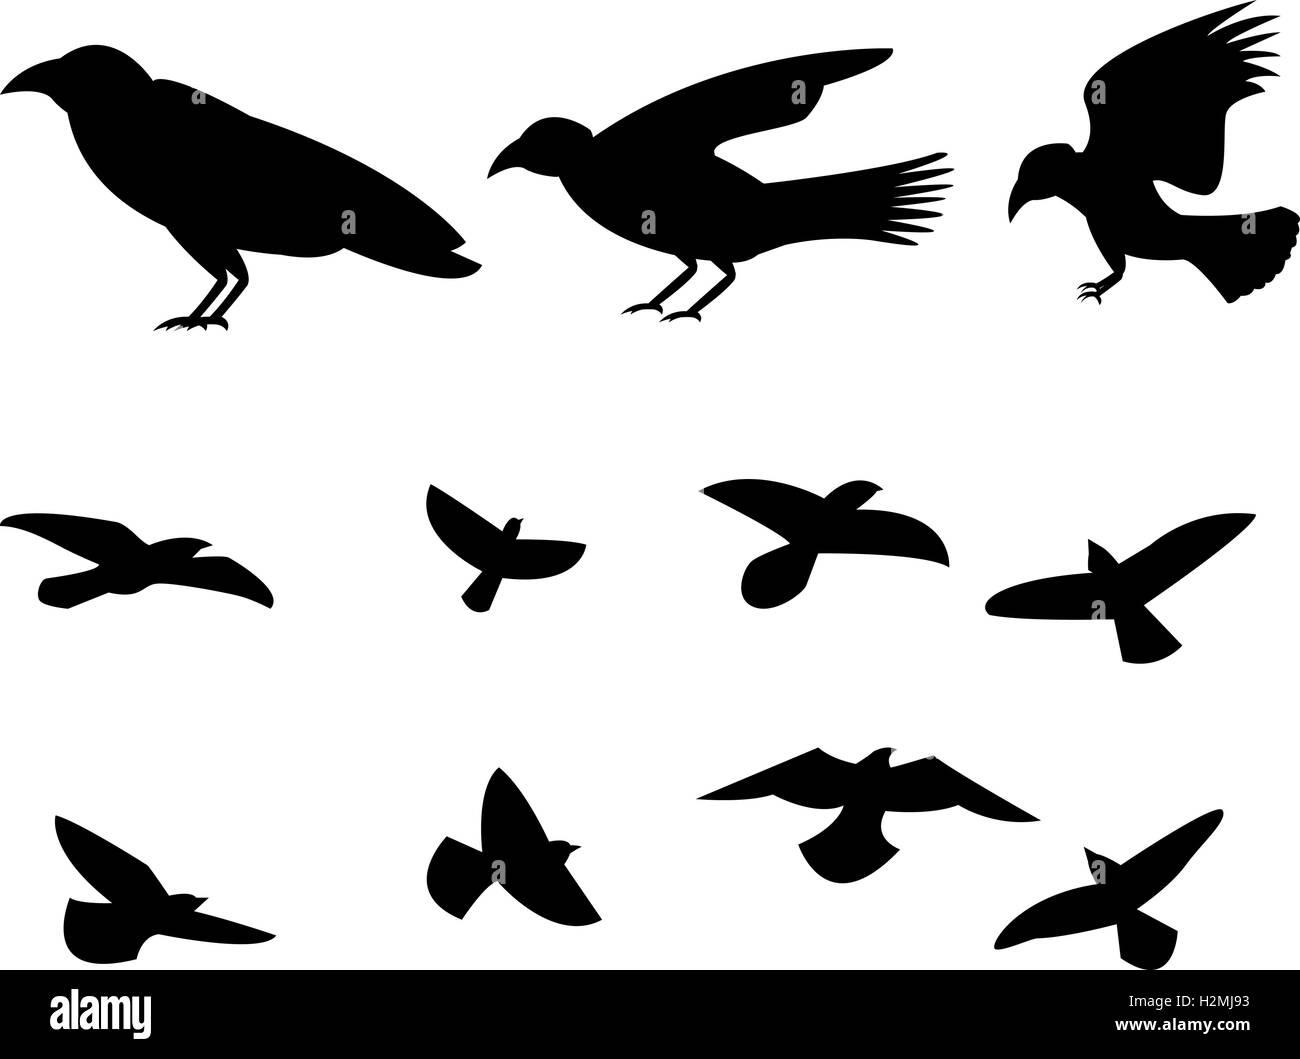 silhouette flying raven bird vector design stock vector art